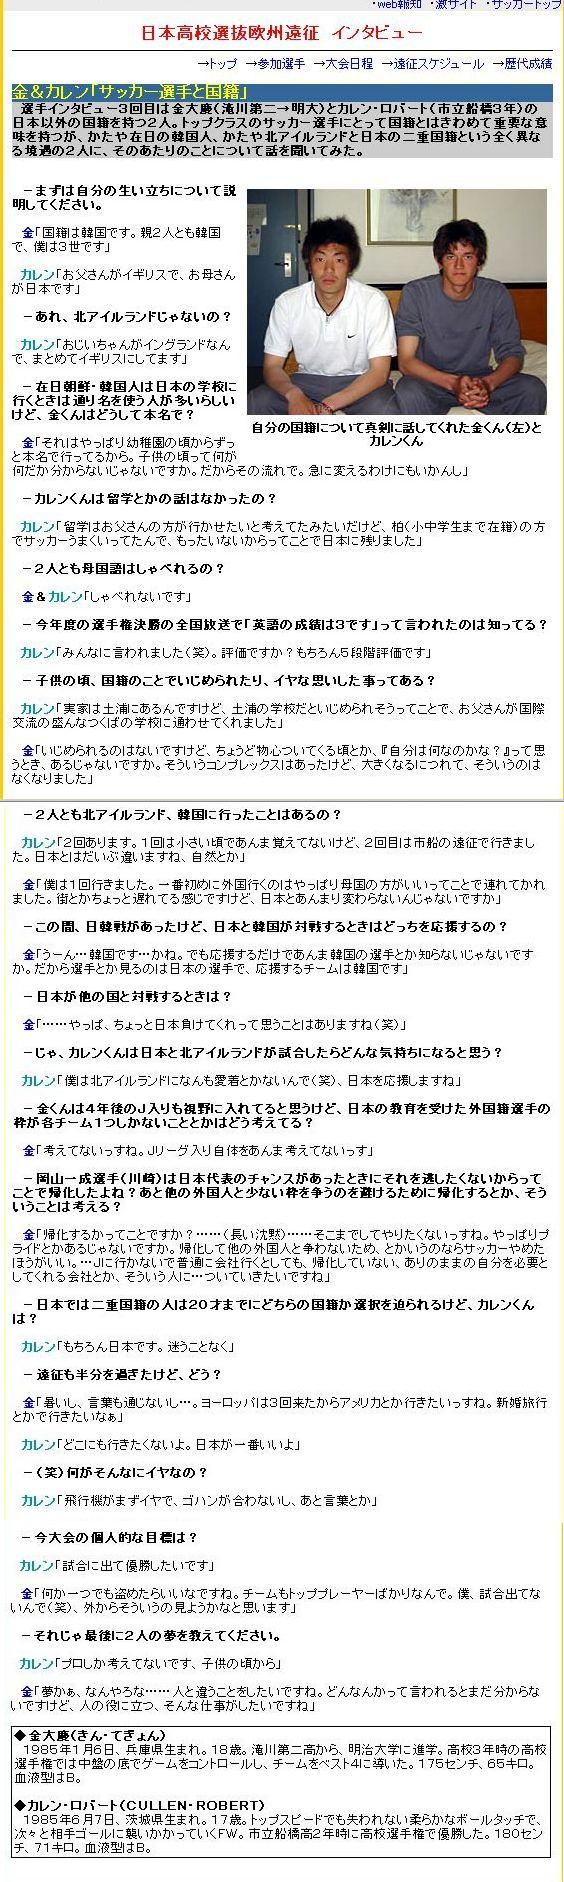 http://livedoor.2.blogimg.jp/dqnplus/imgs/4/0/40032c3d.jpg